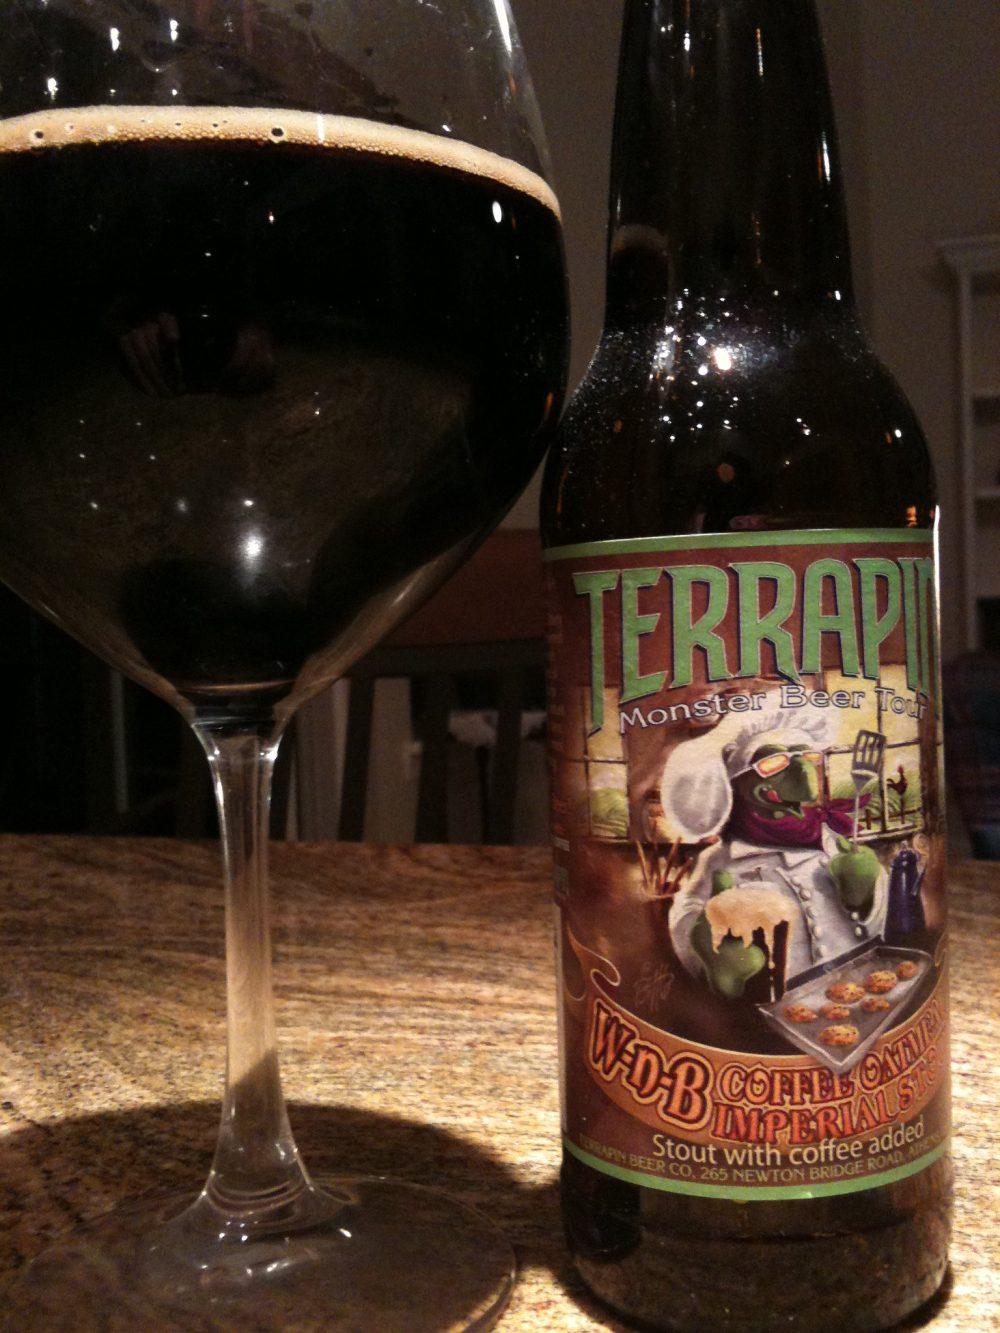 Terrapin's Wake-n-Bake Coffee Oatmeal Imperial Stout